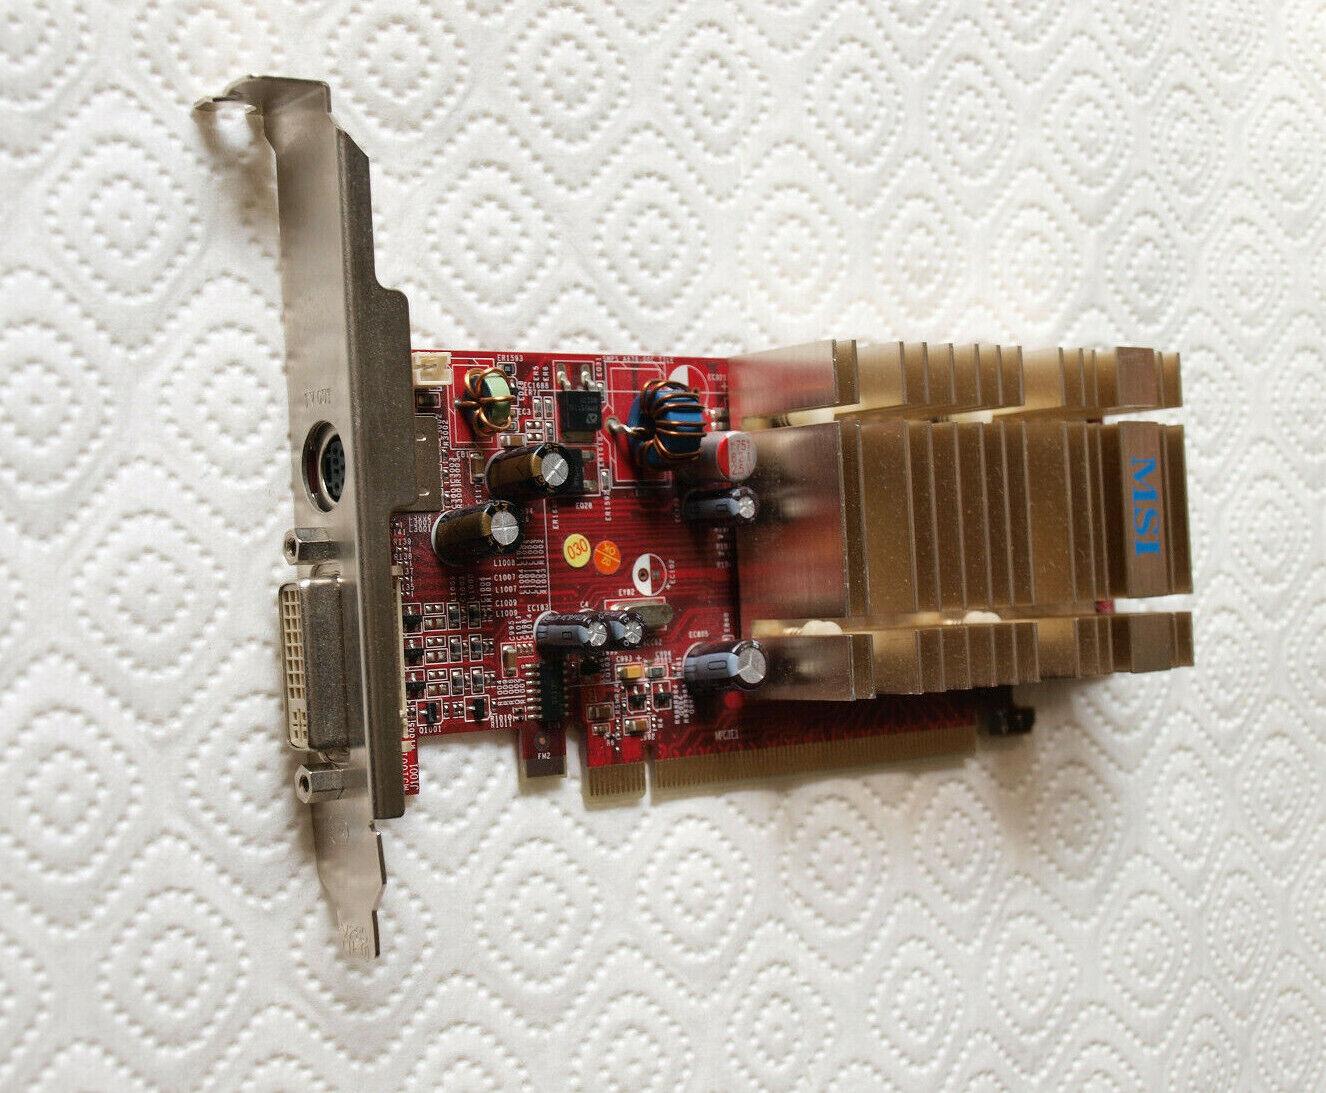 Graphics MSI ATI RX1550